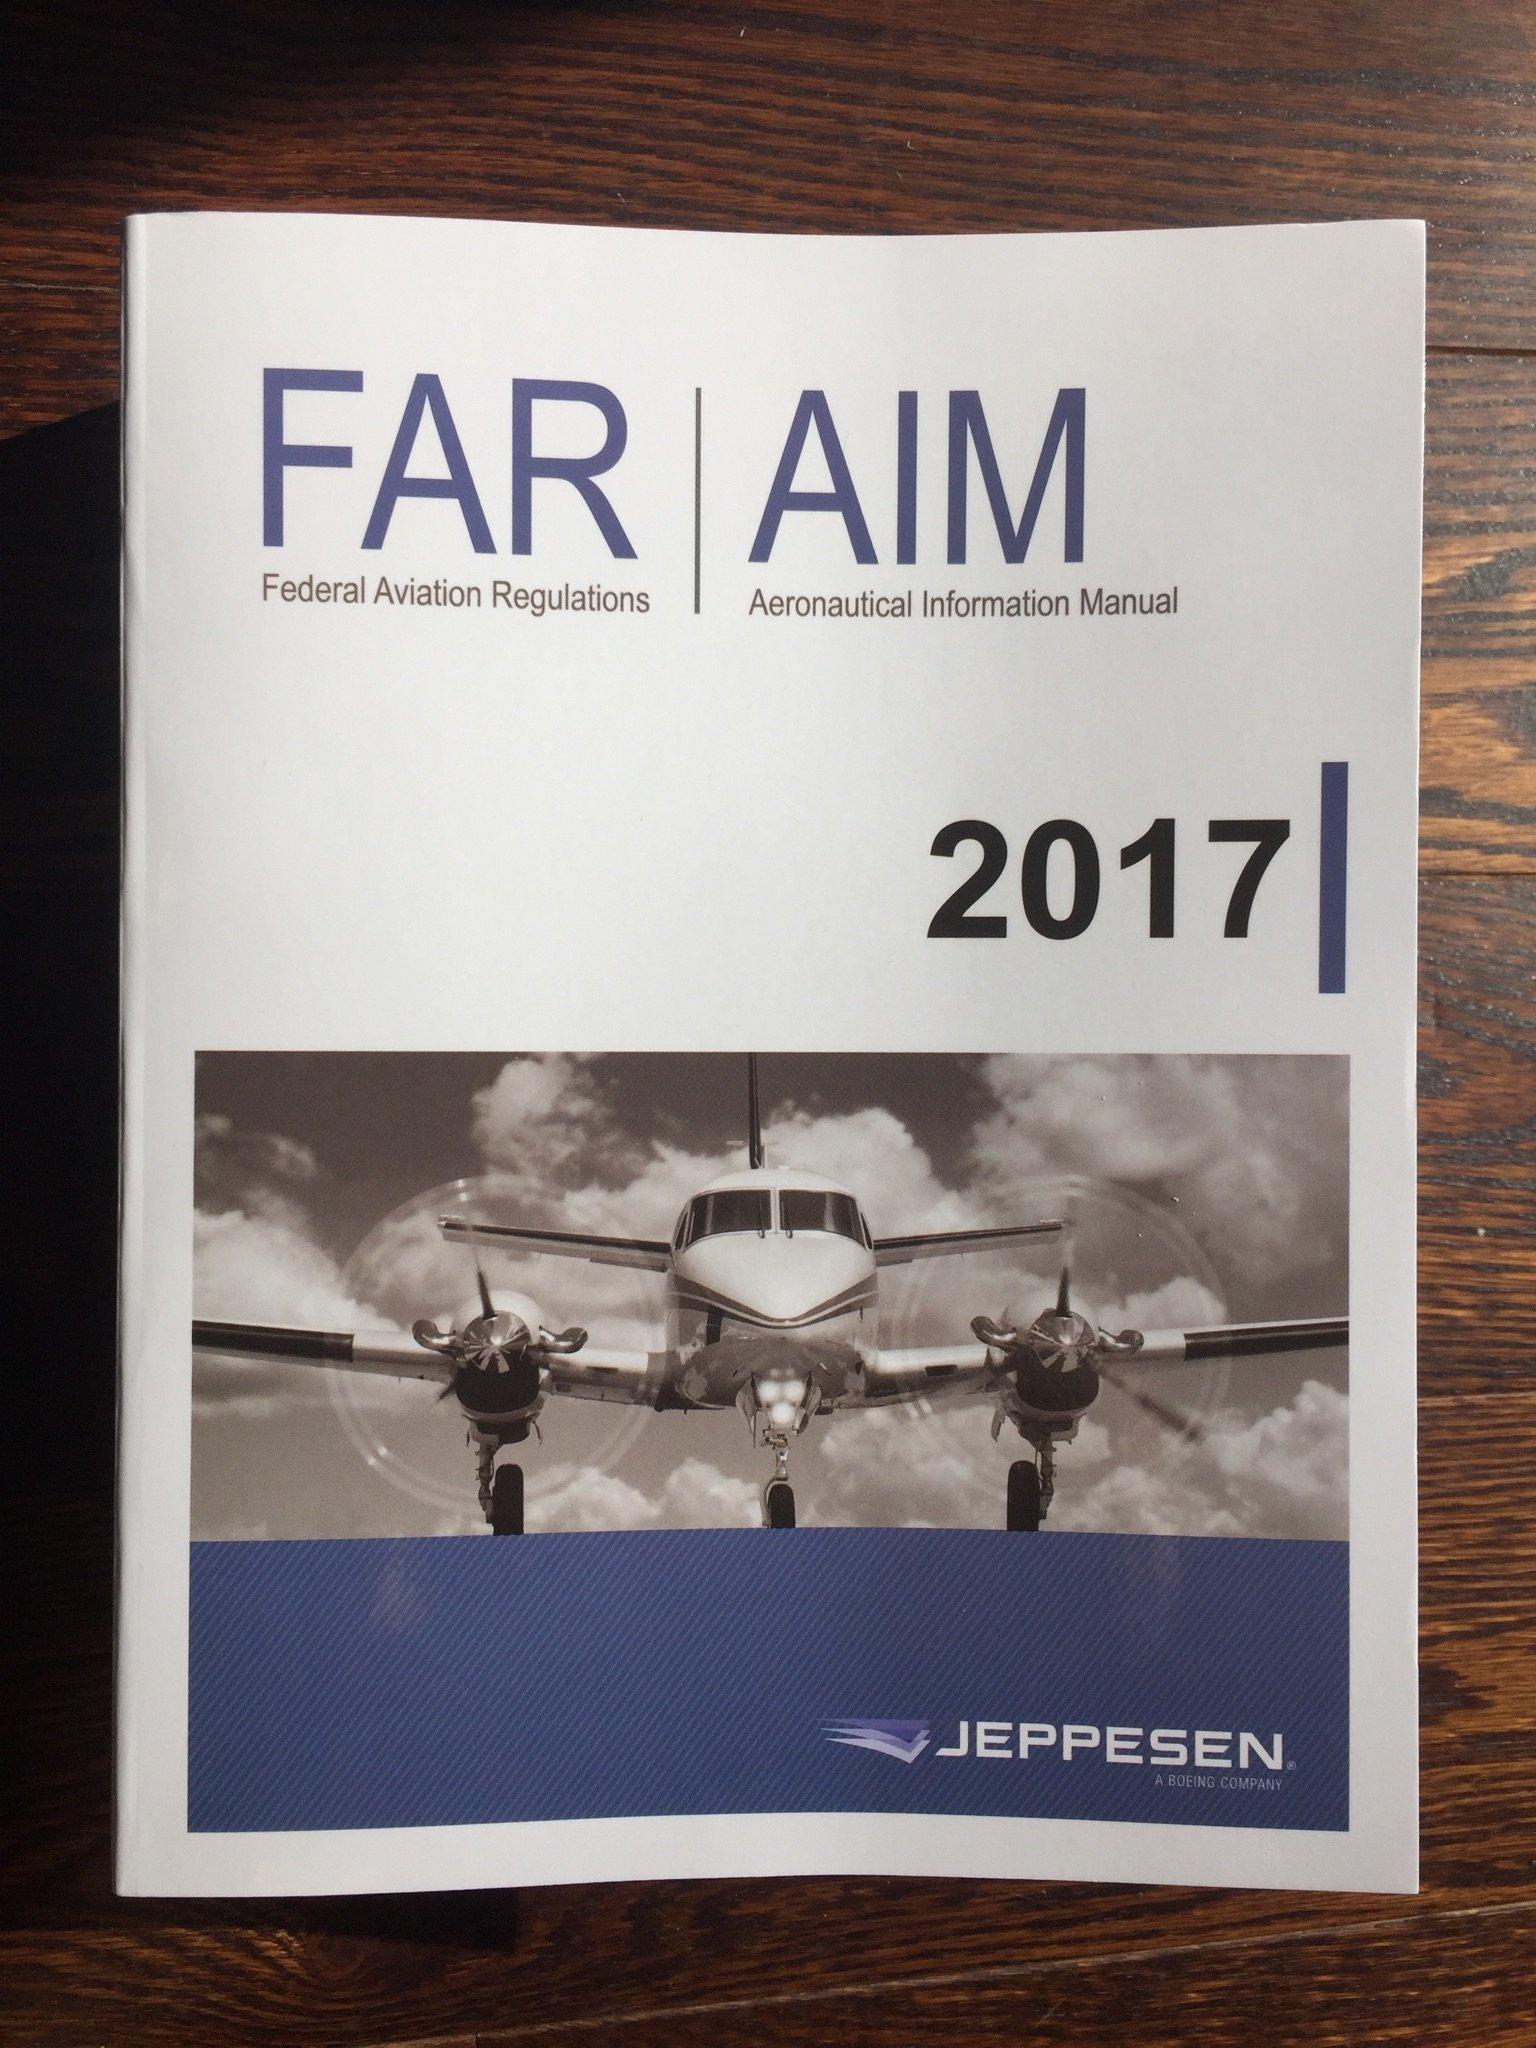 Faraim manual 2017 jeppesen 9780884872061 amazon books fandeluxe Image collections